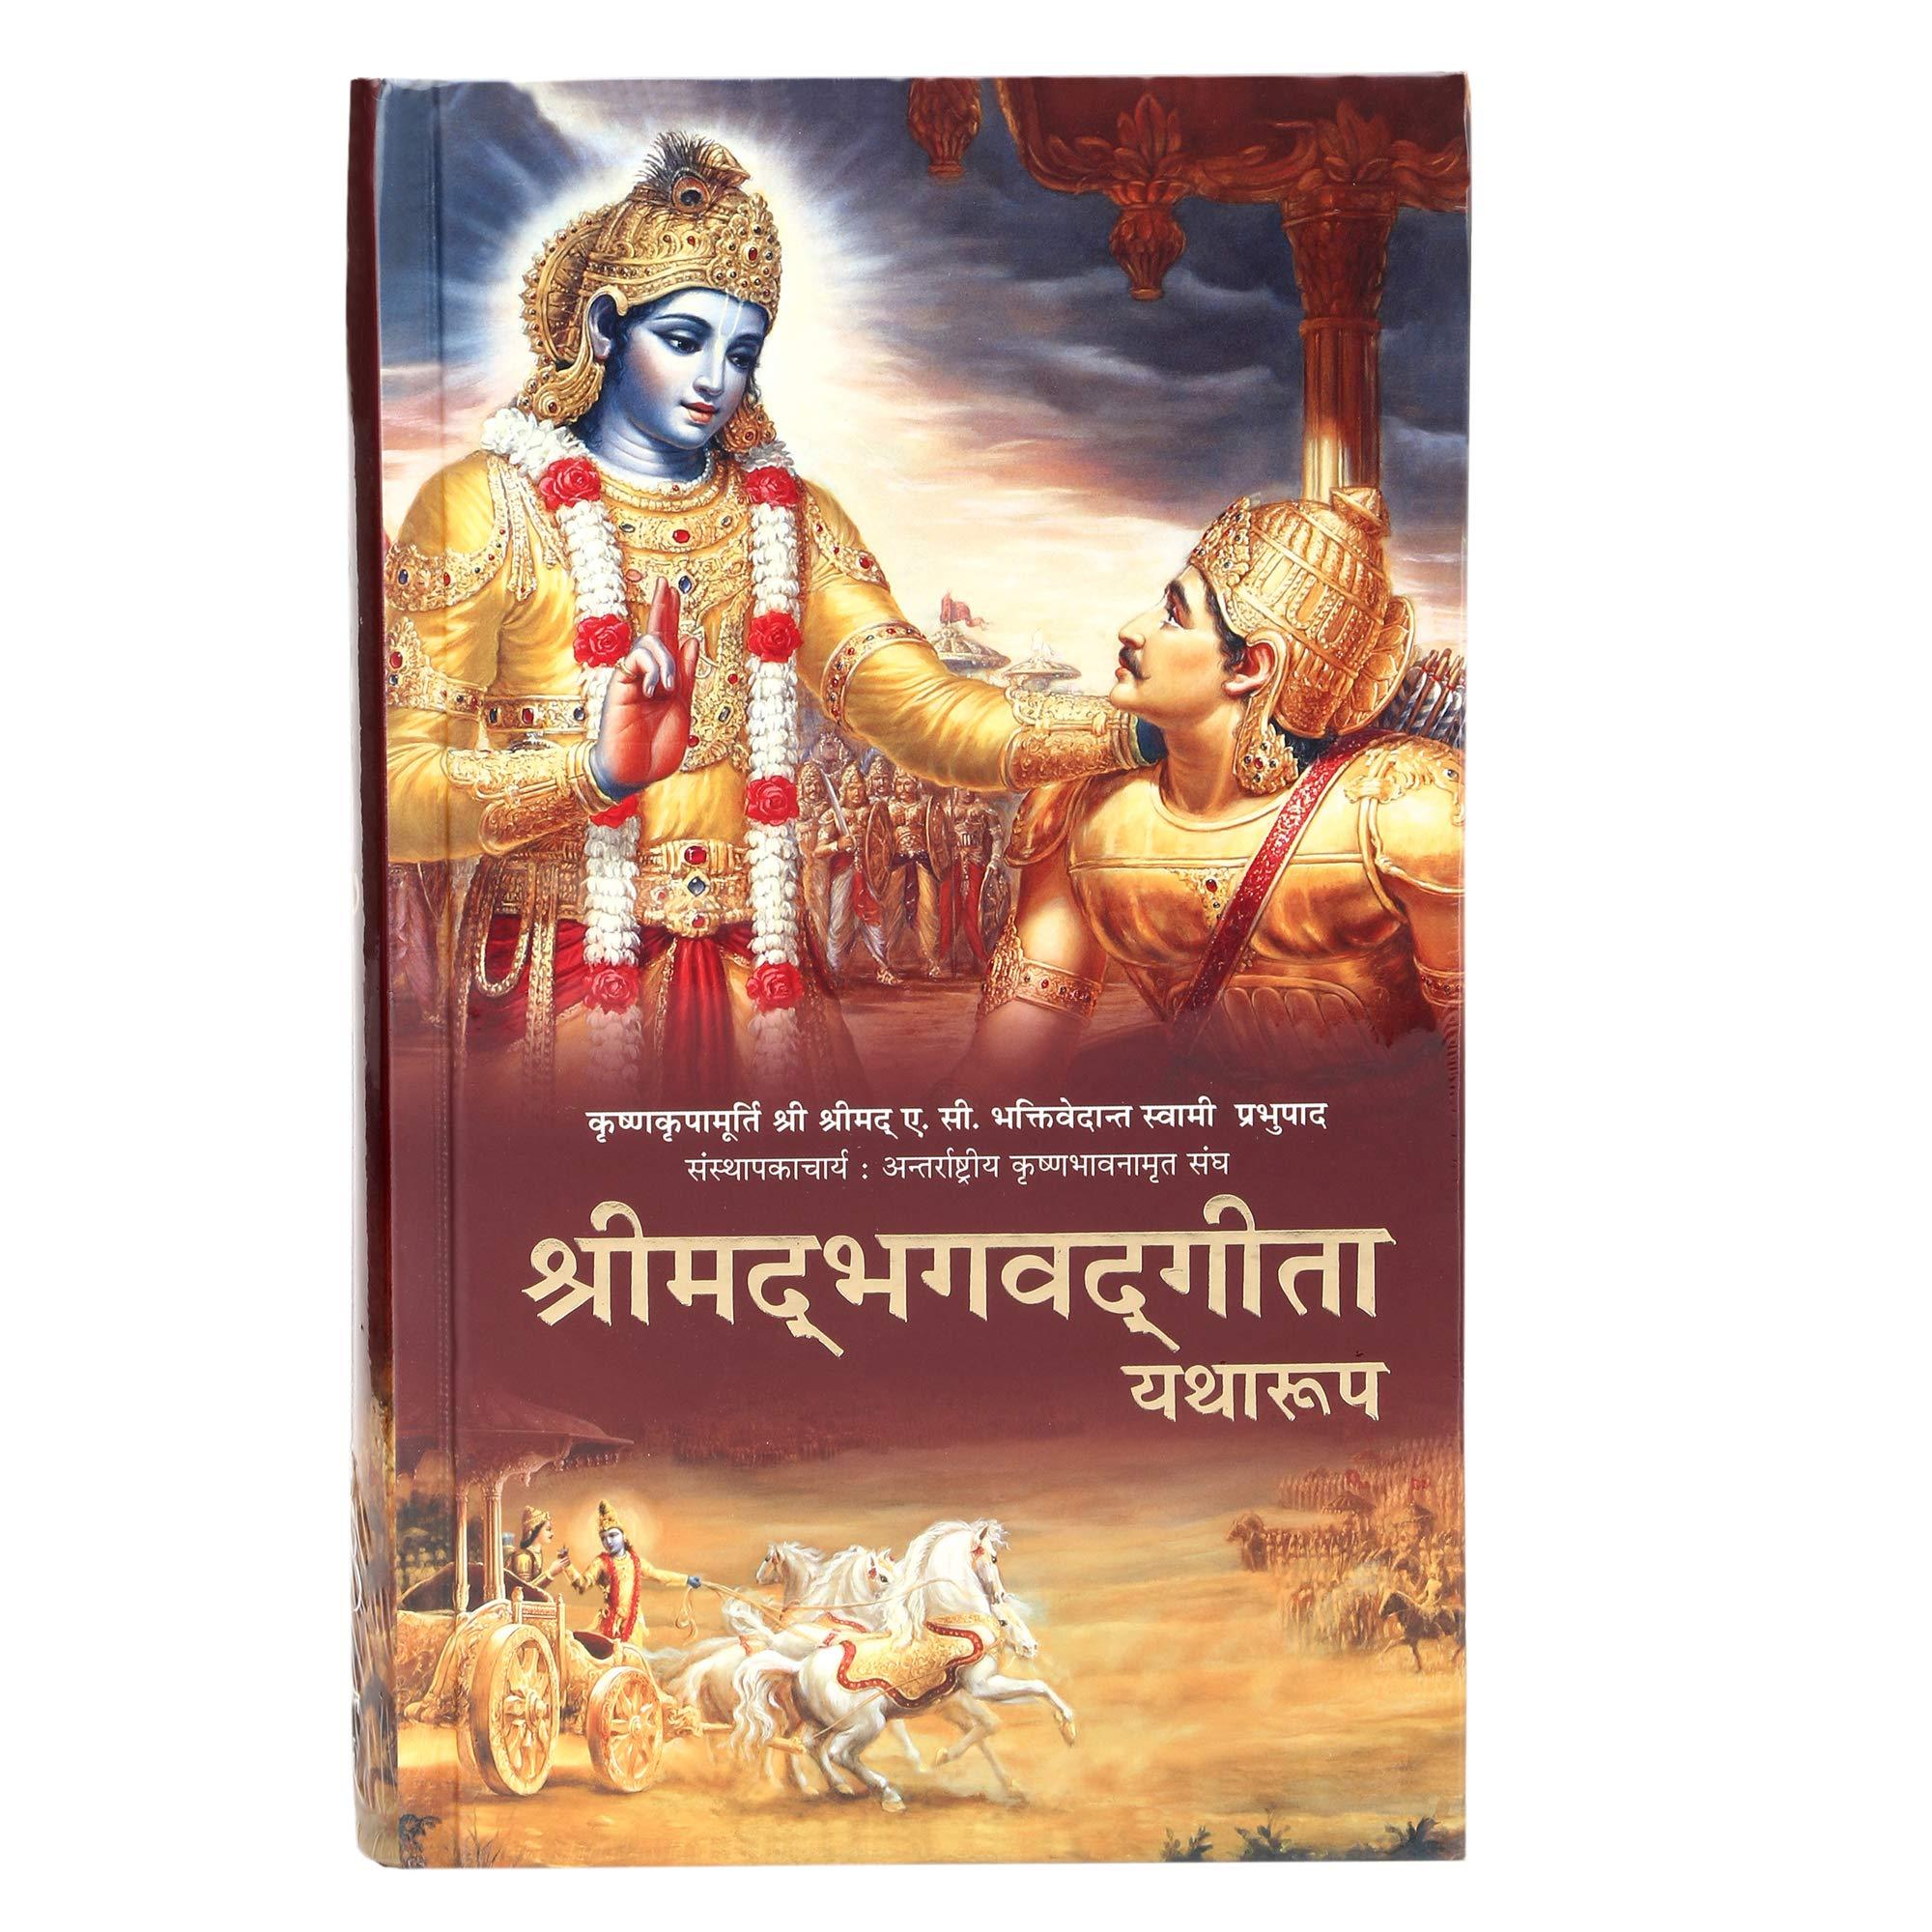 Shrimad Bhagavad Gita In Epub Download